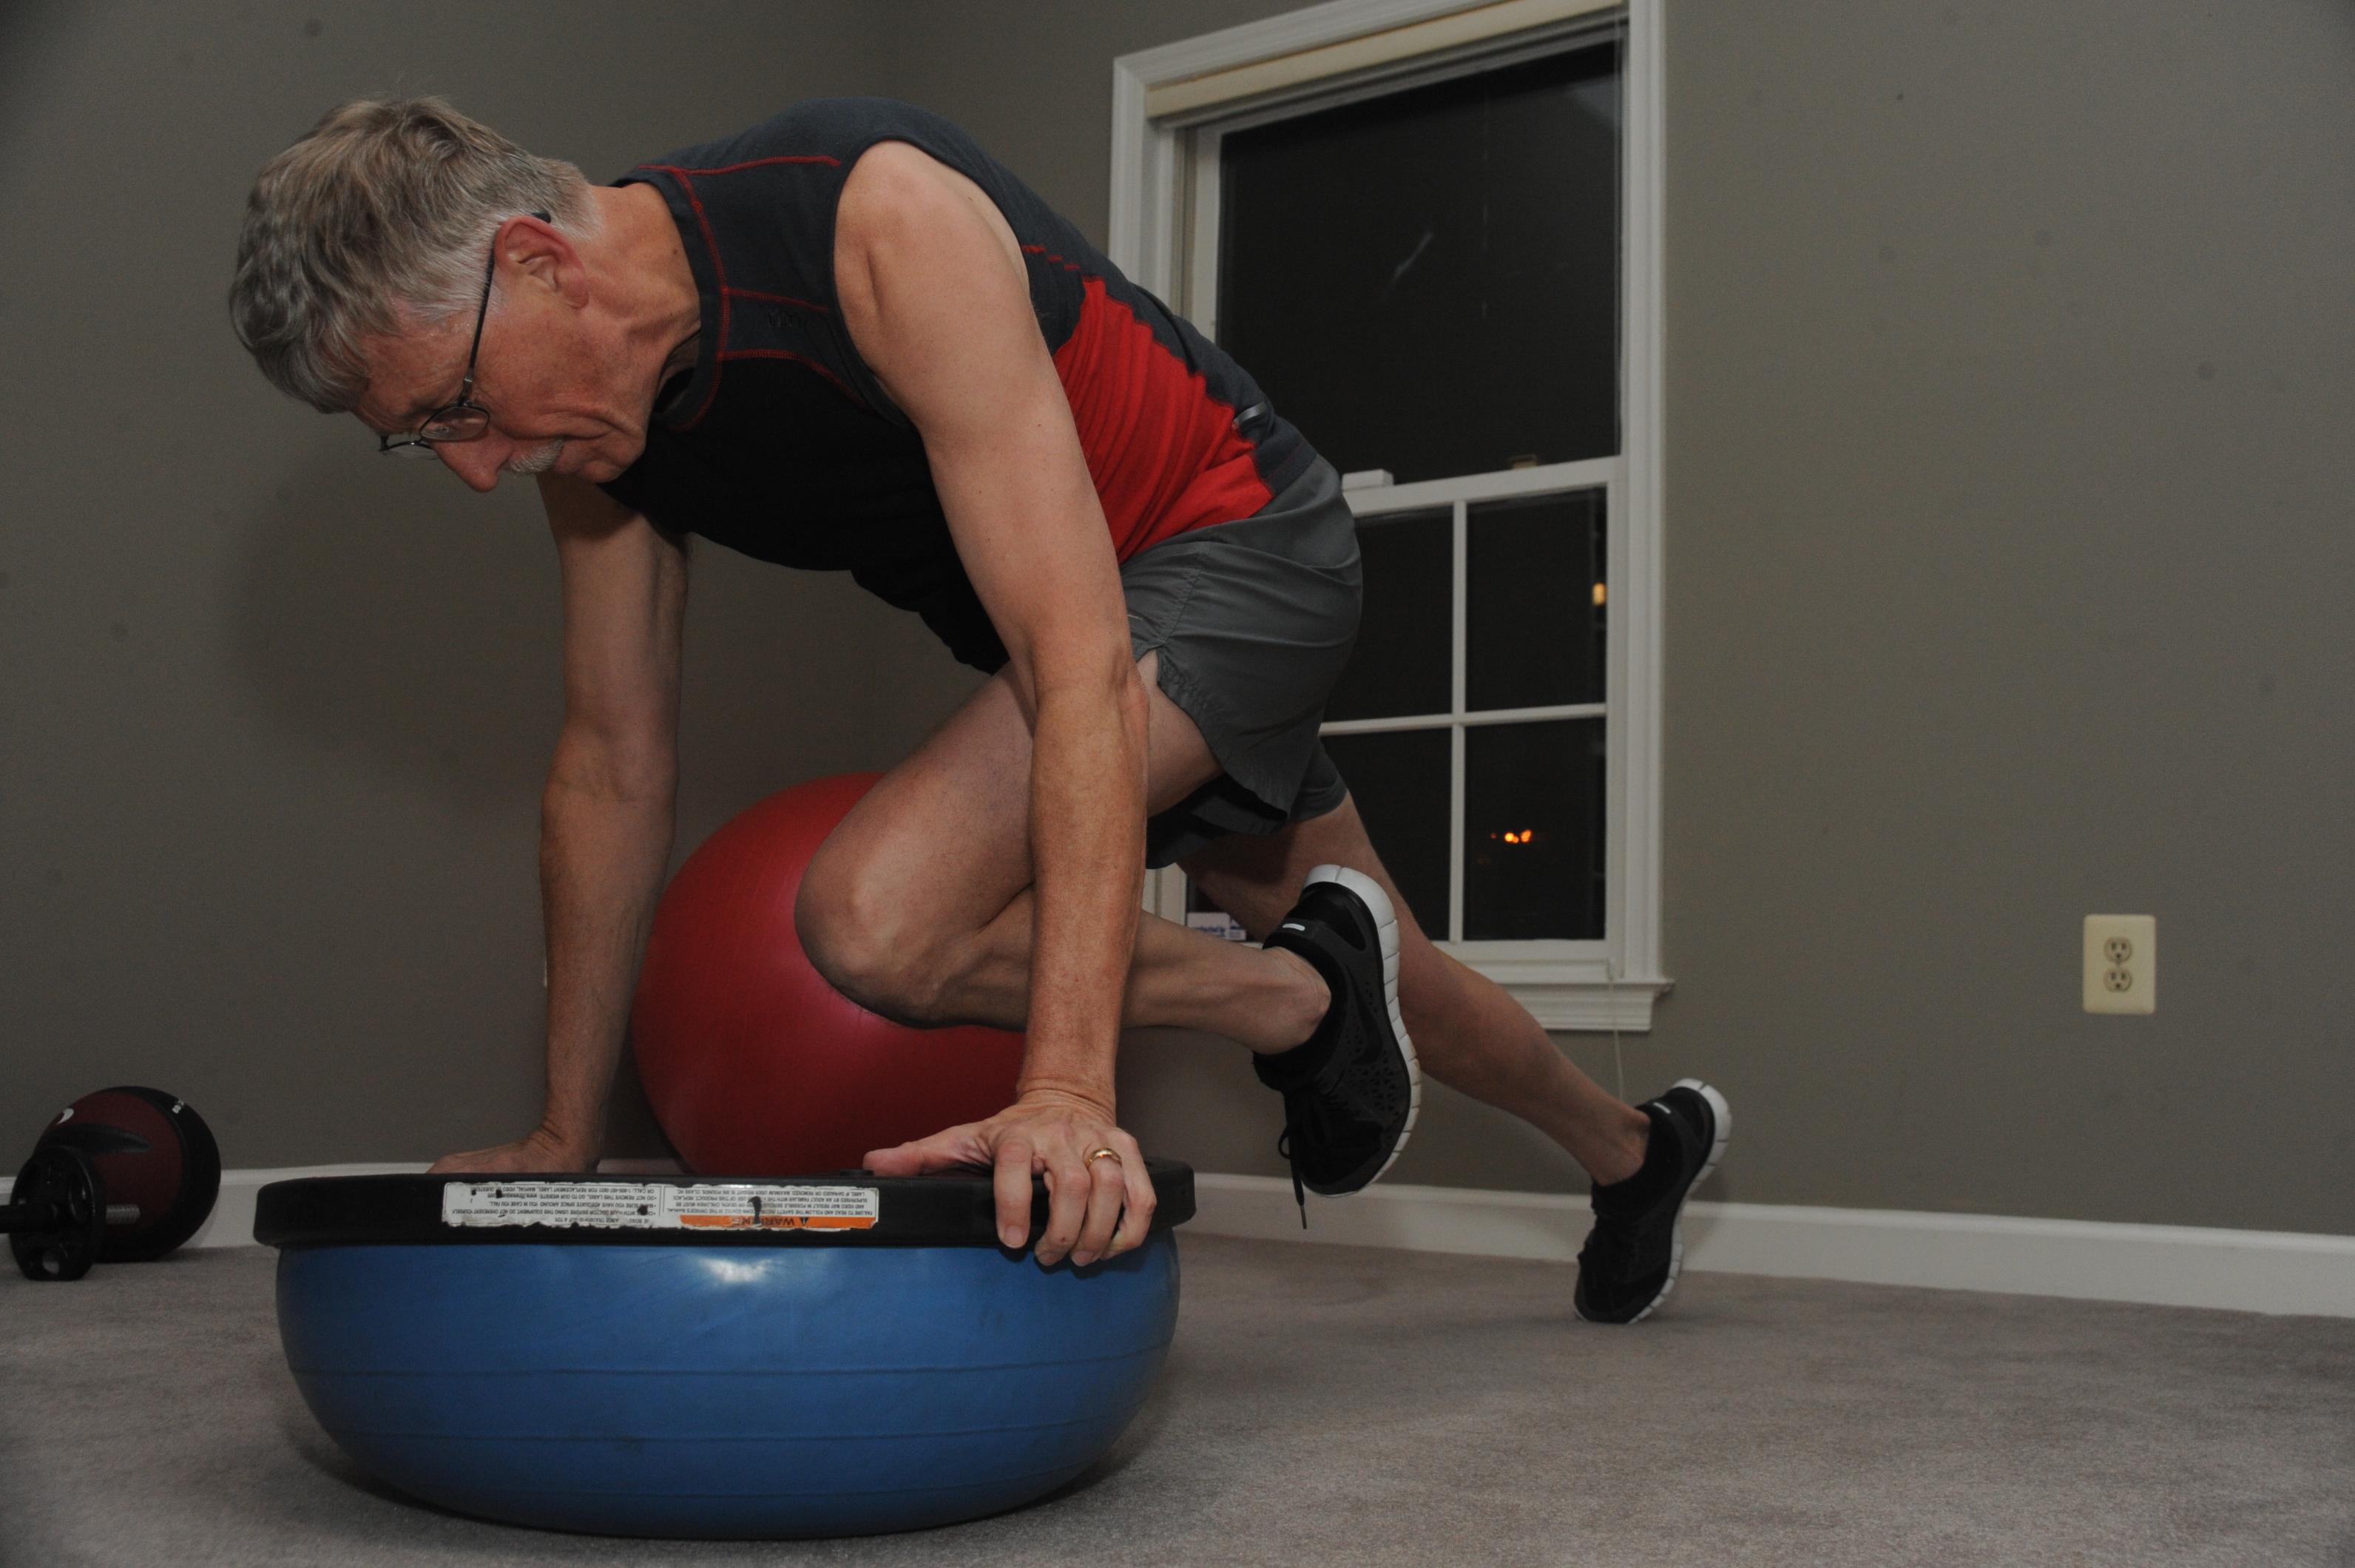 Man exercising with a BOSU ball